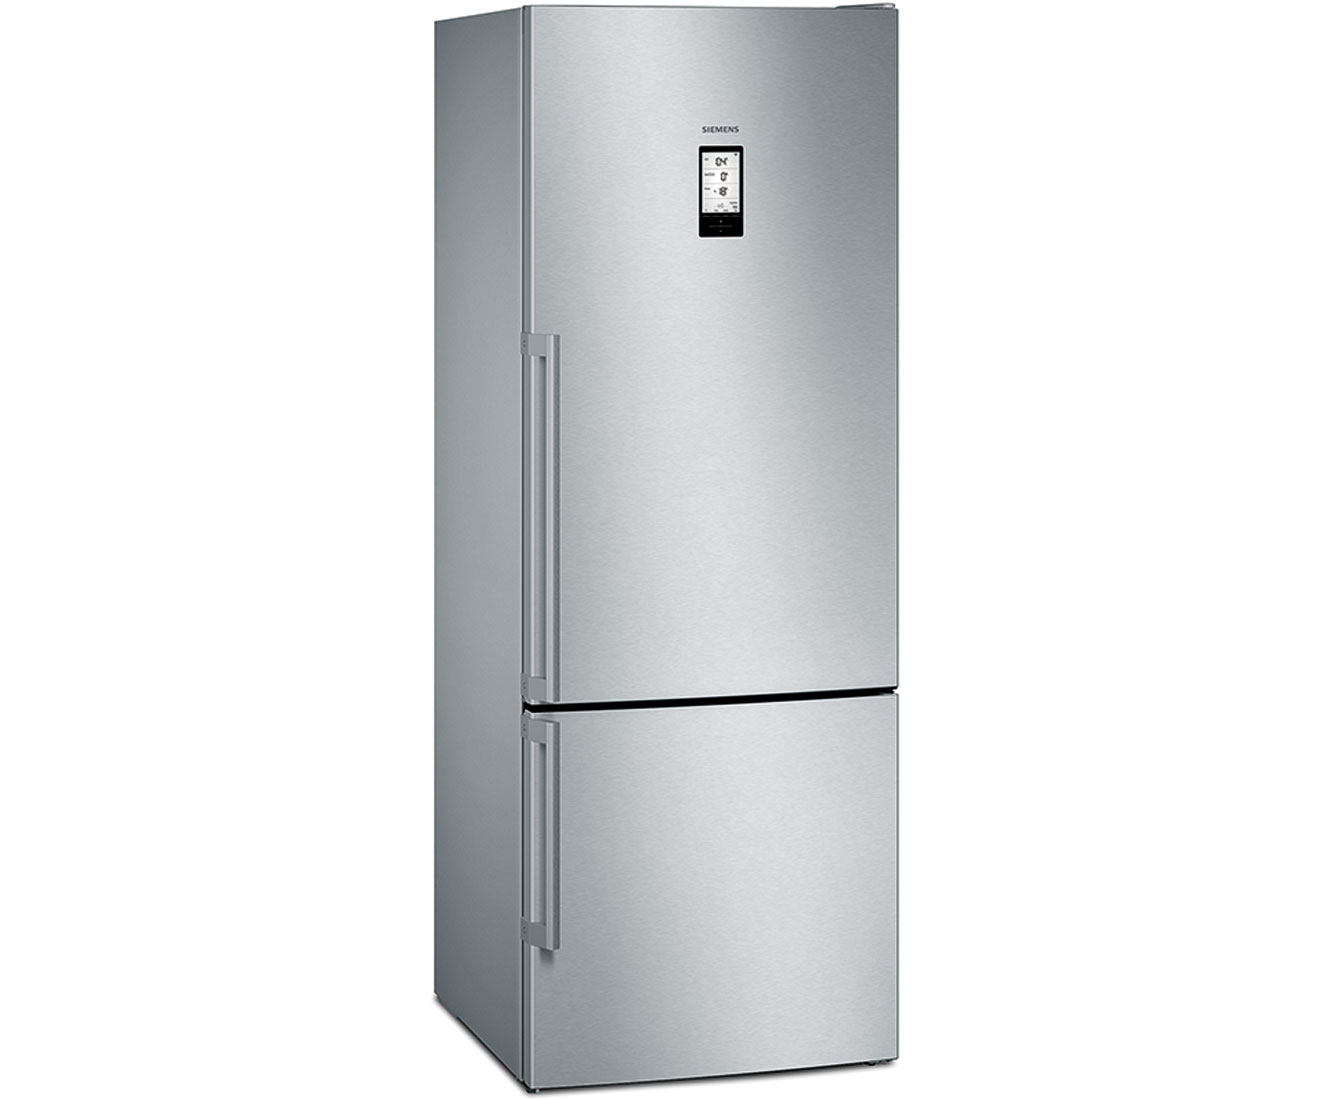 Kühlschrank Alarm : Siemens kühlschrank alarm leuchtet rot siemens kühlschrank alarm